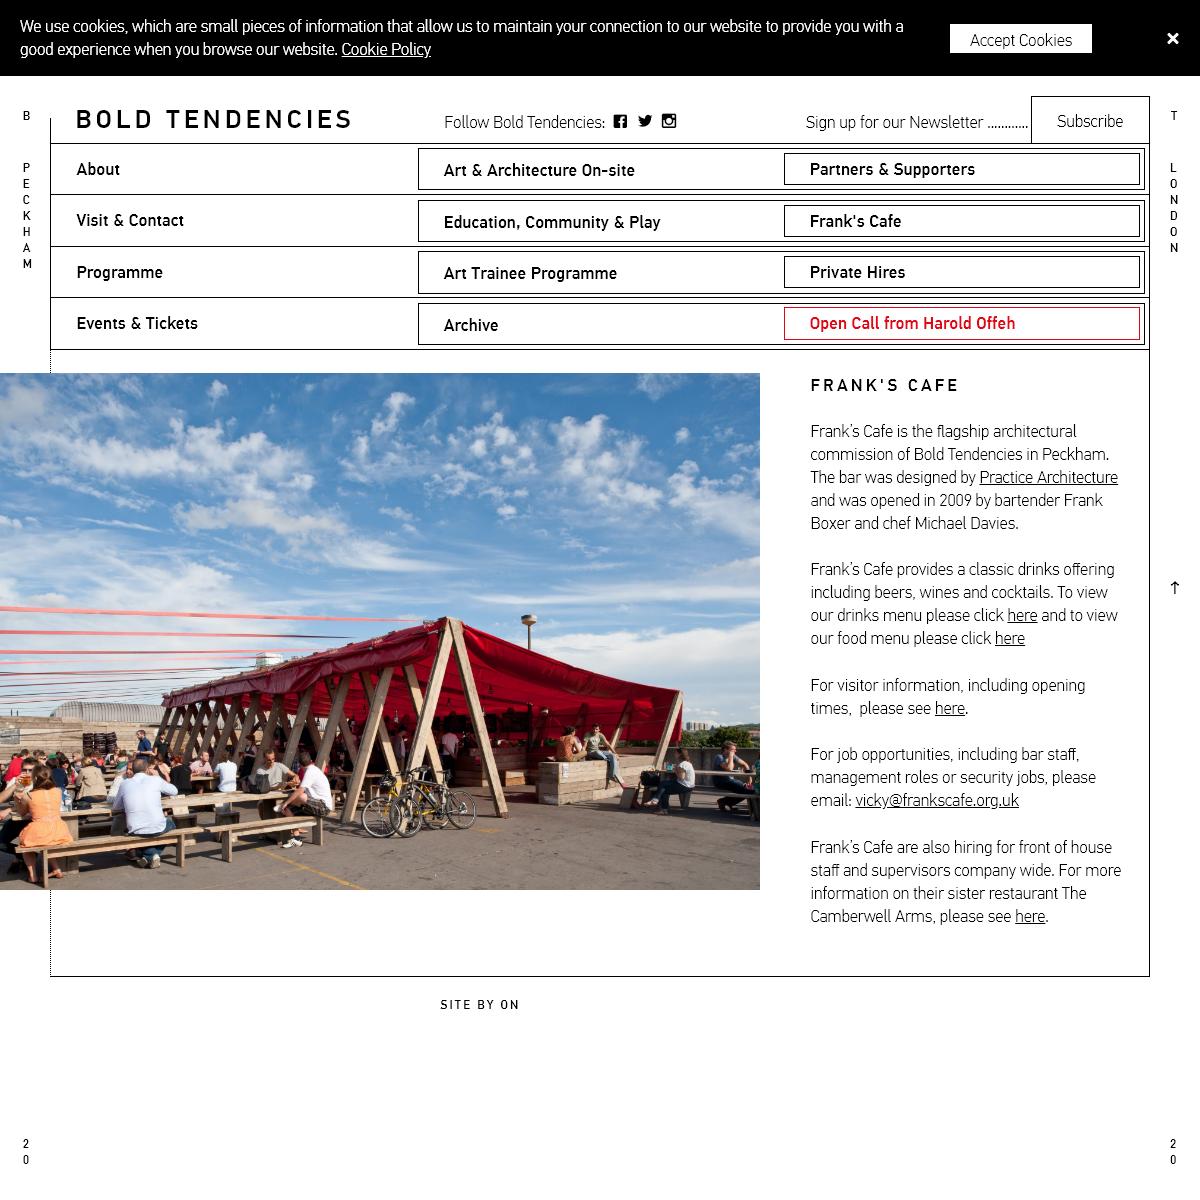 Bold Tendencies - Frank's Cafe